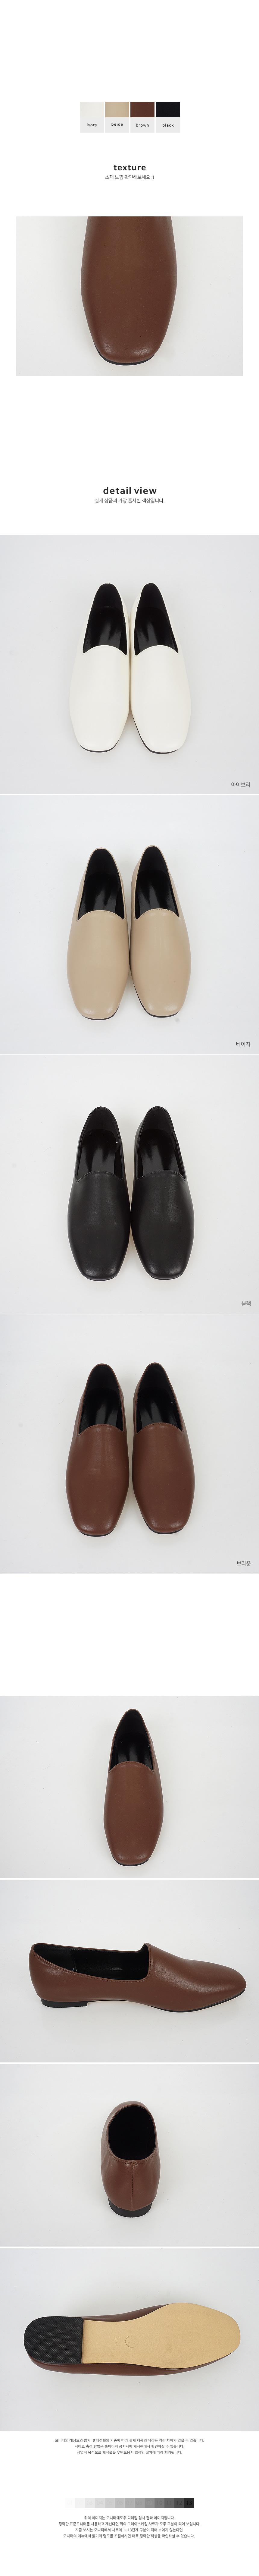 Post leather flat